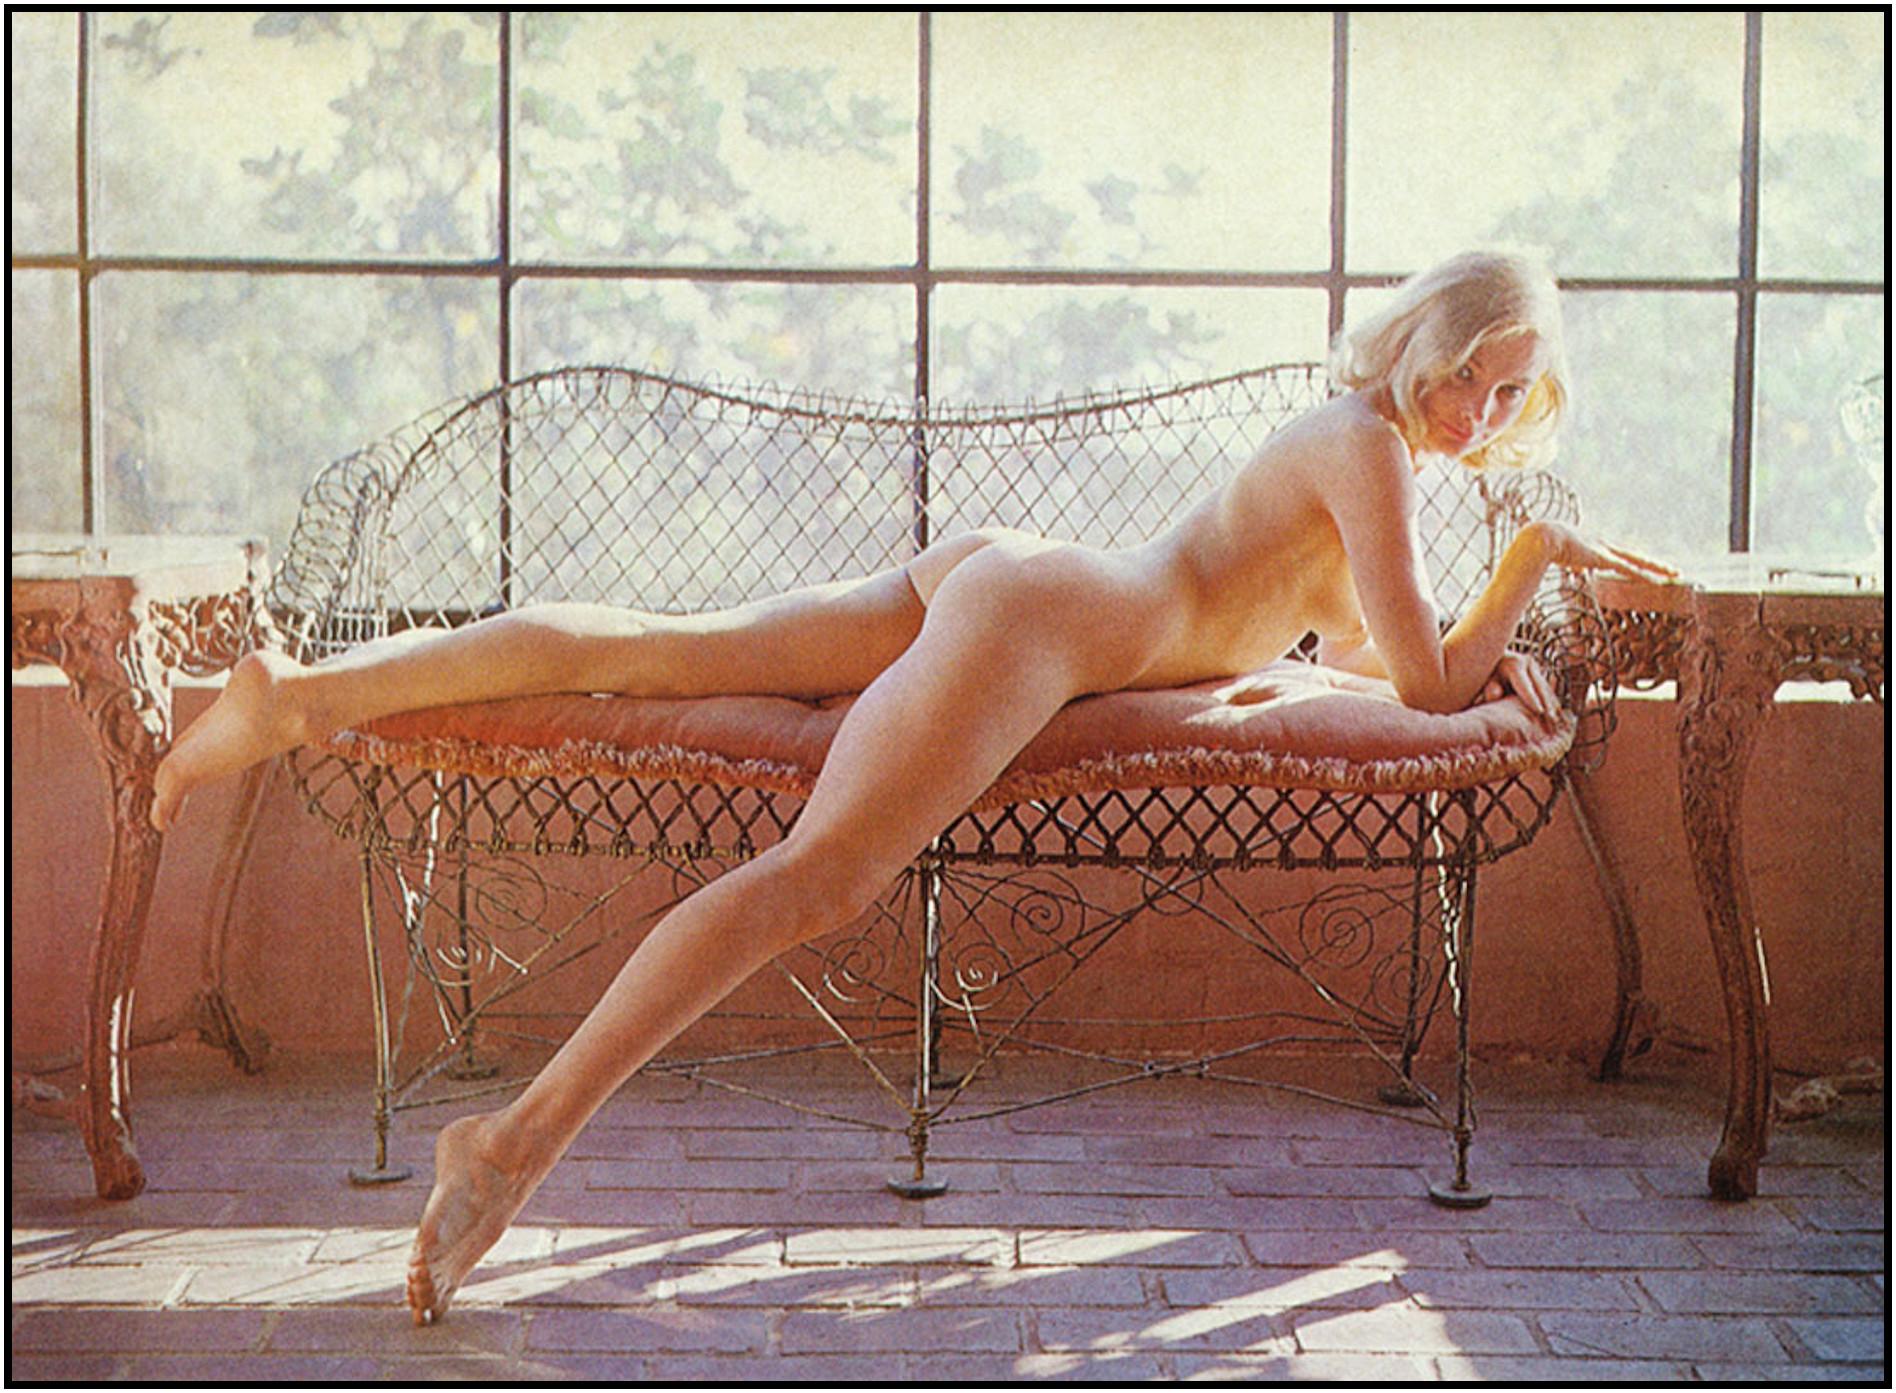 Debbie Osborne Nude Sex Cheryl Powell And Others Nude Too